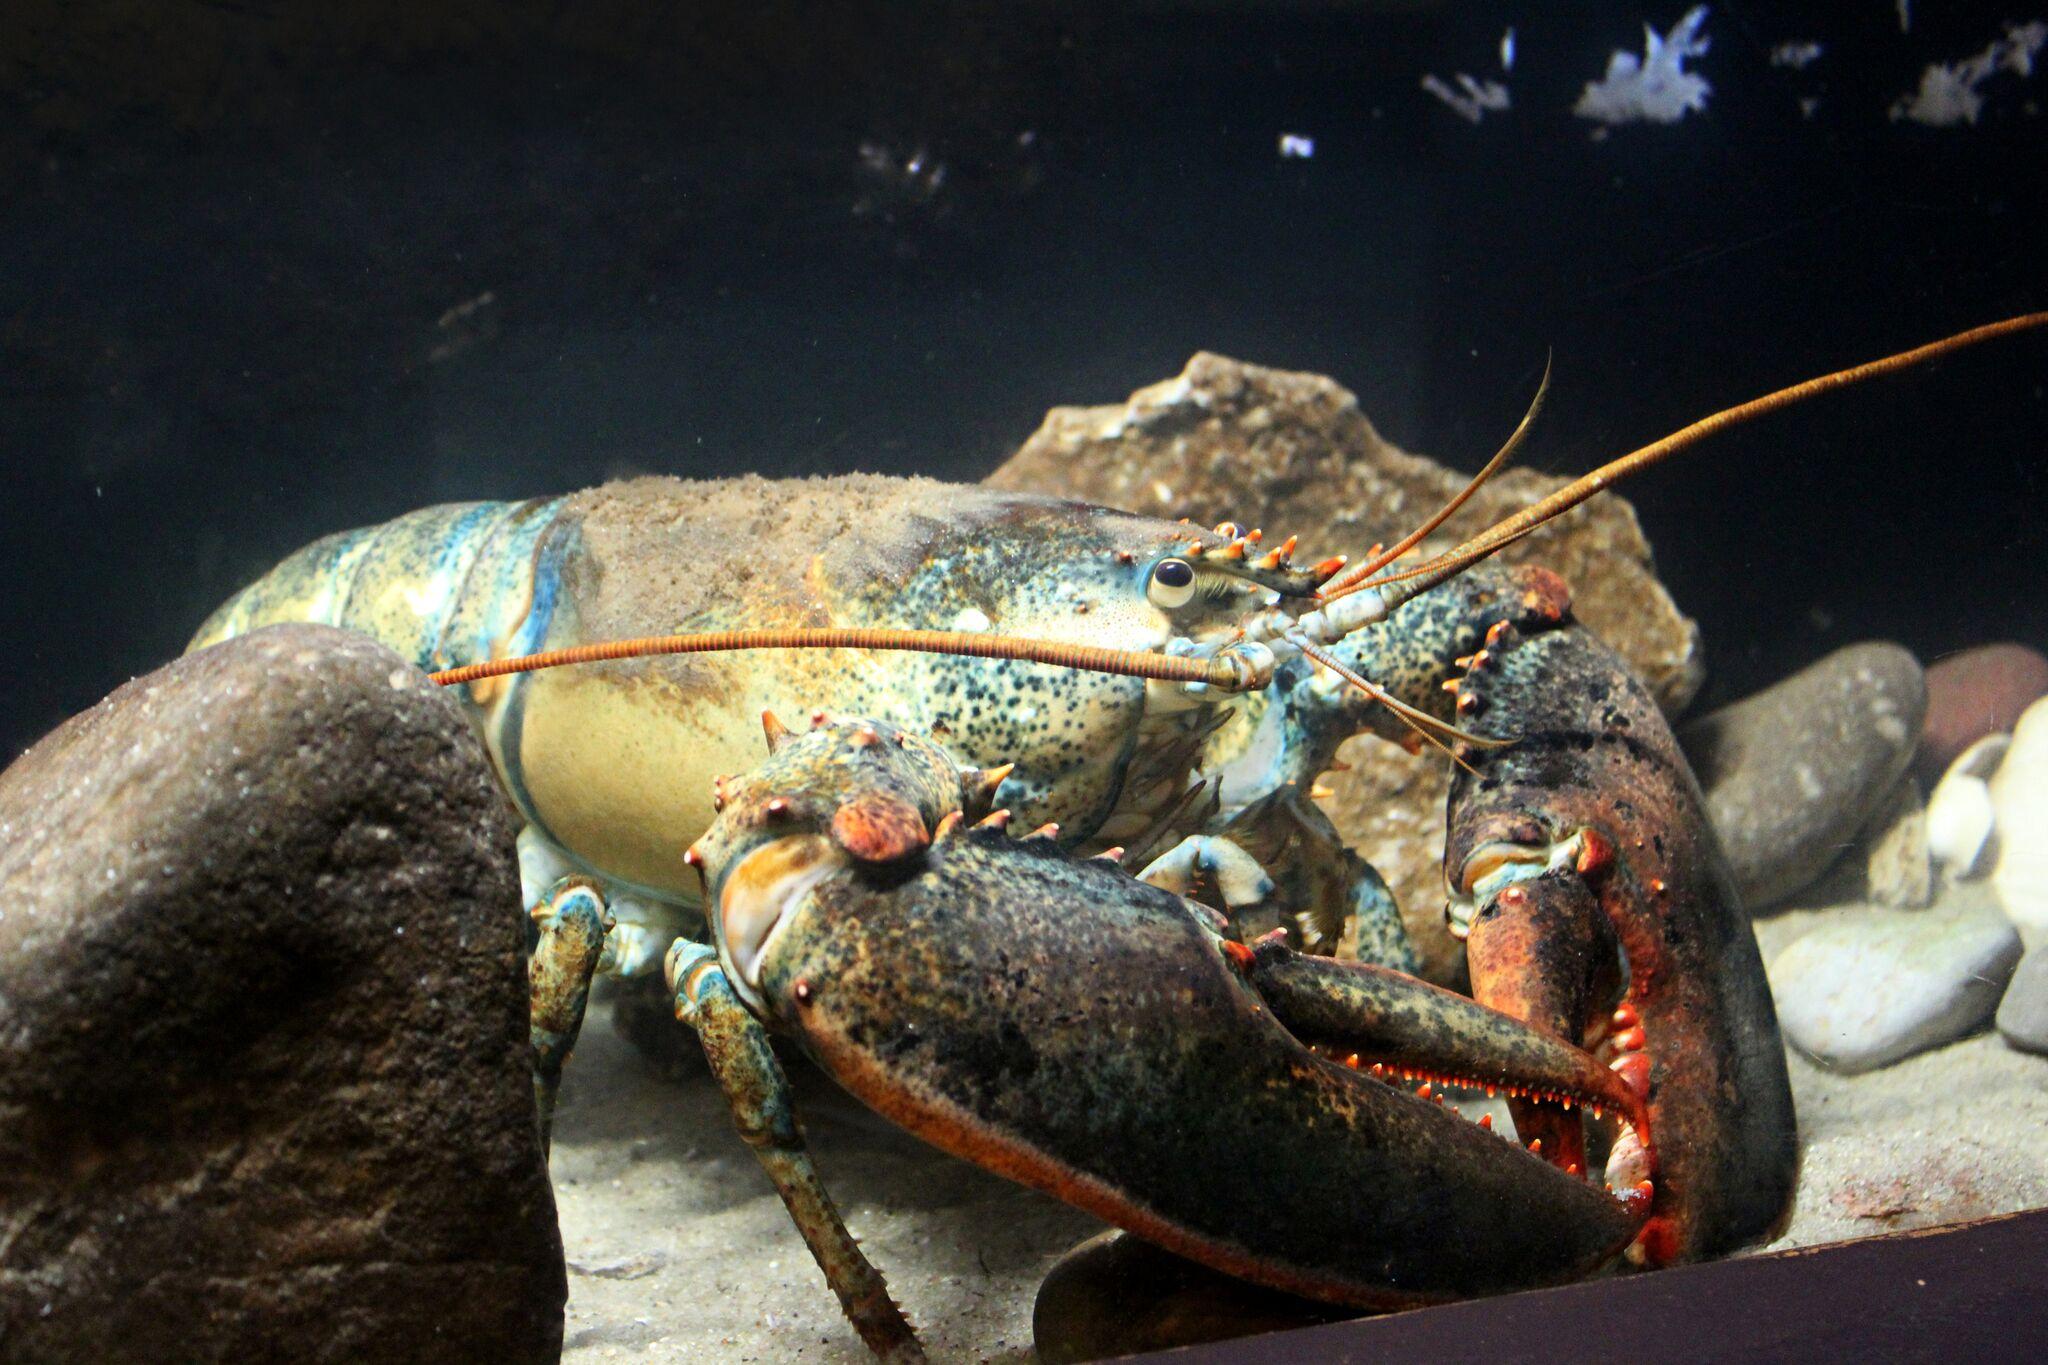 dino-crab.jpg